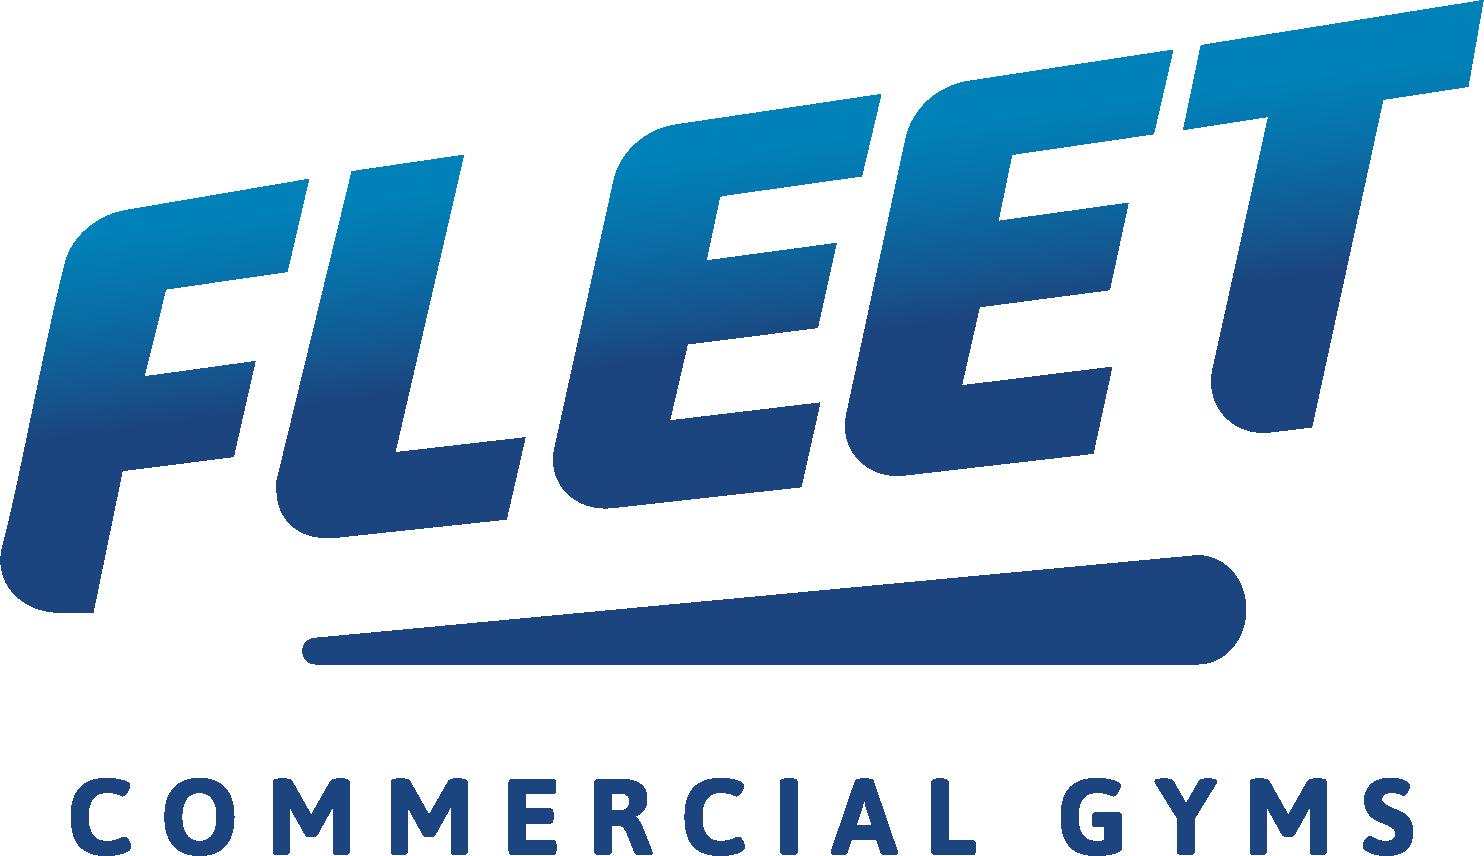 Fleet Commercial Gymnasiums